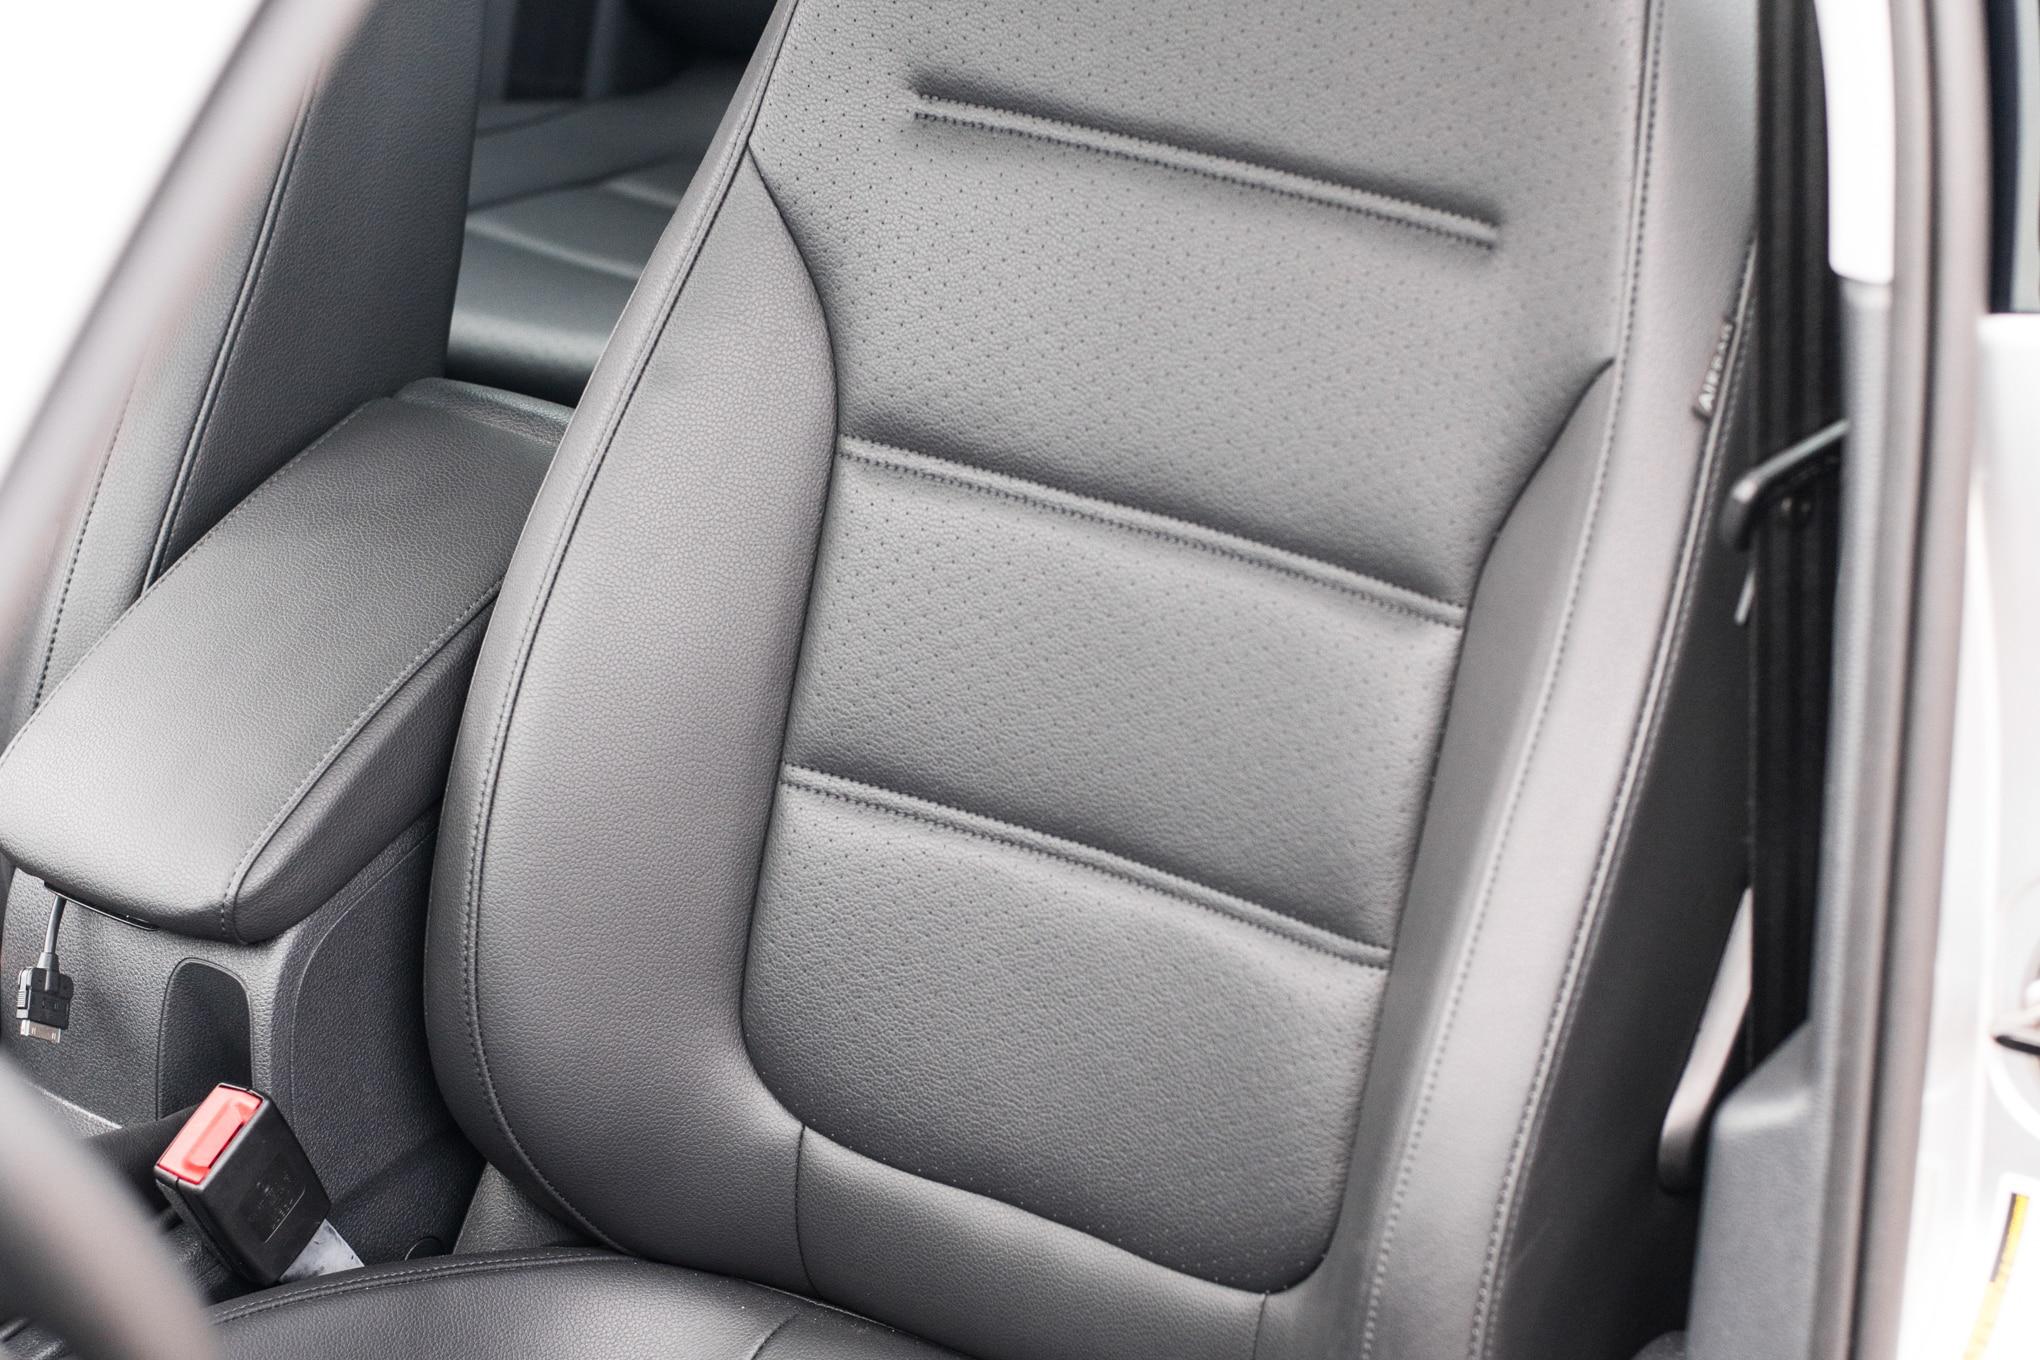 2014 compact sedan comparison review day 4 automobile magazine. Black Bedroom Furniture Sets. Home Design Ideas